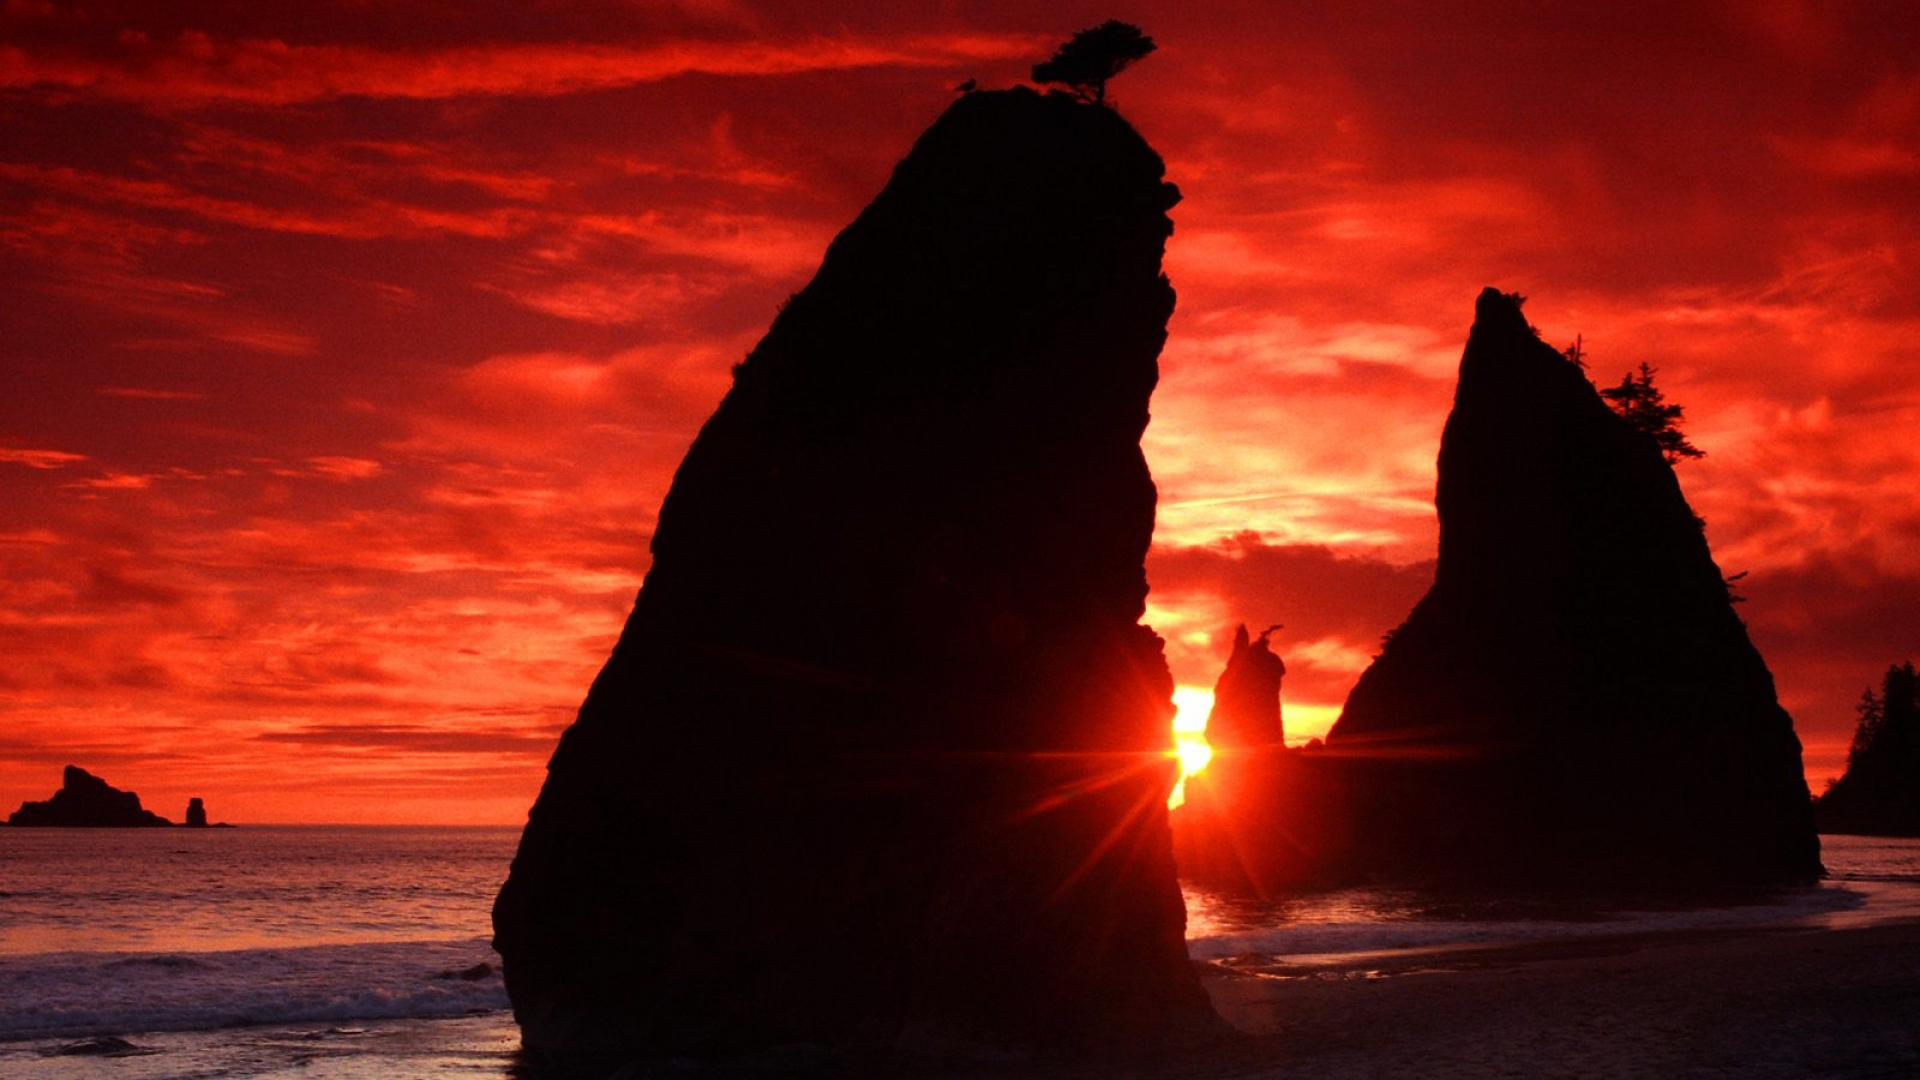 Amazing Wallpaper Laptop Sunset - eye-catching-red-sunset-beach-wallpaper-1920x1080-336  2018_28678.jpg